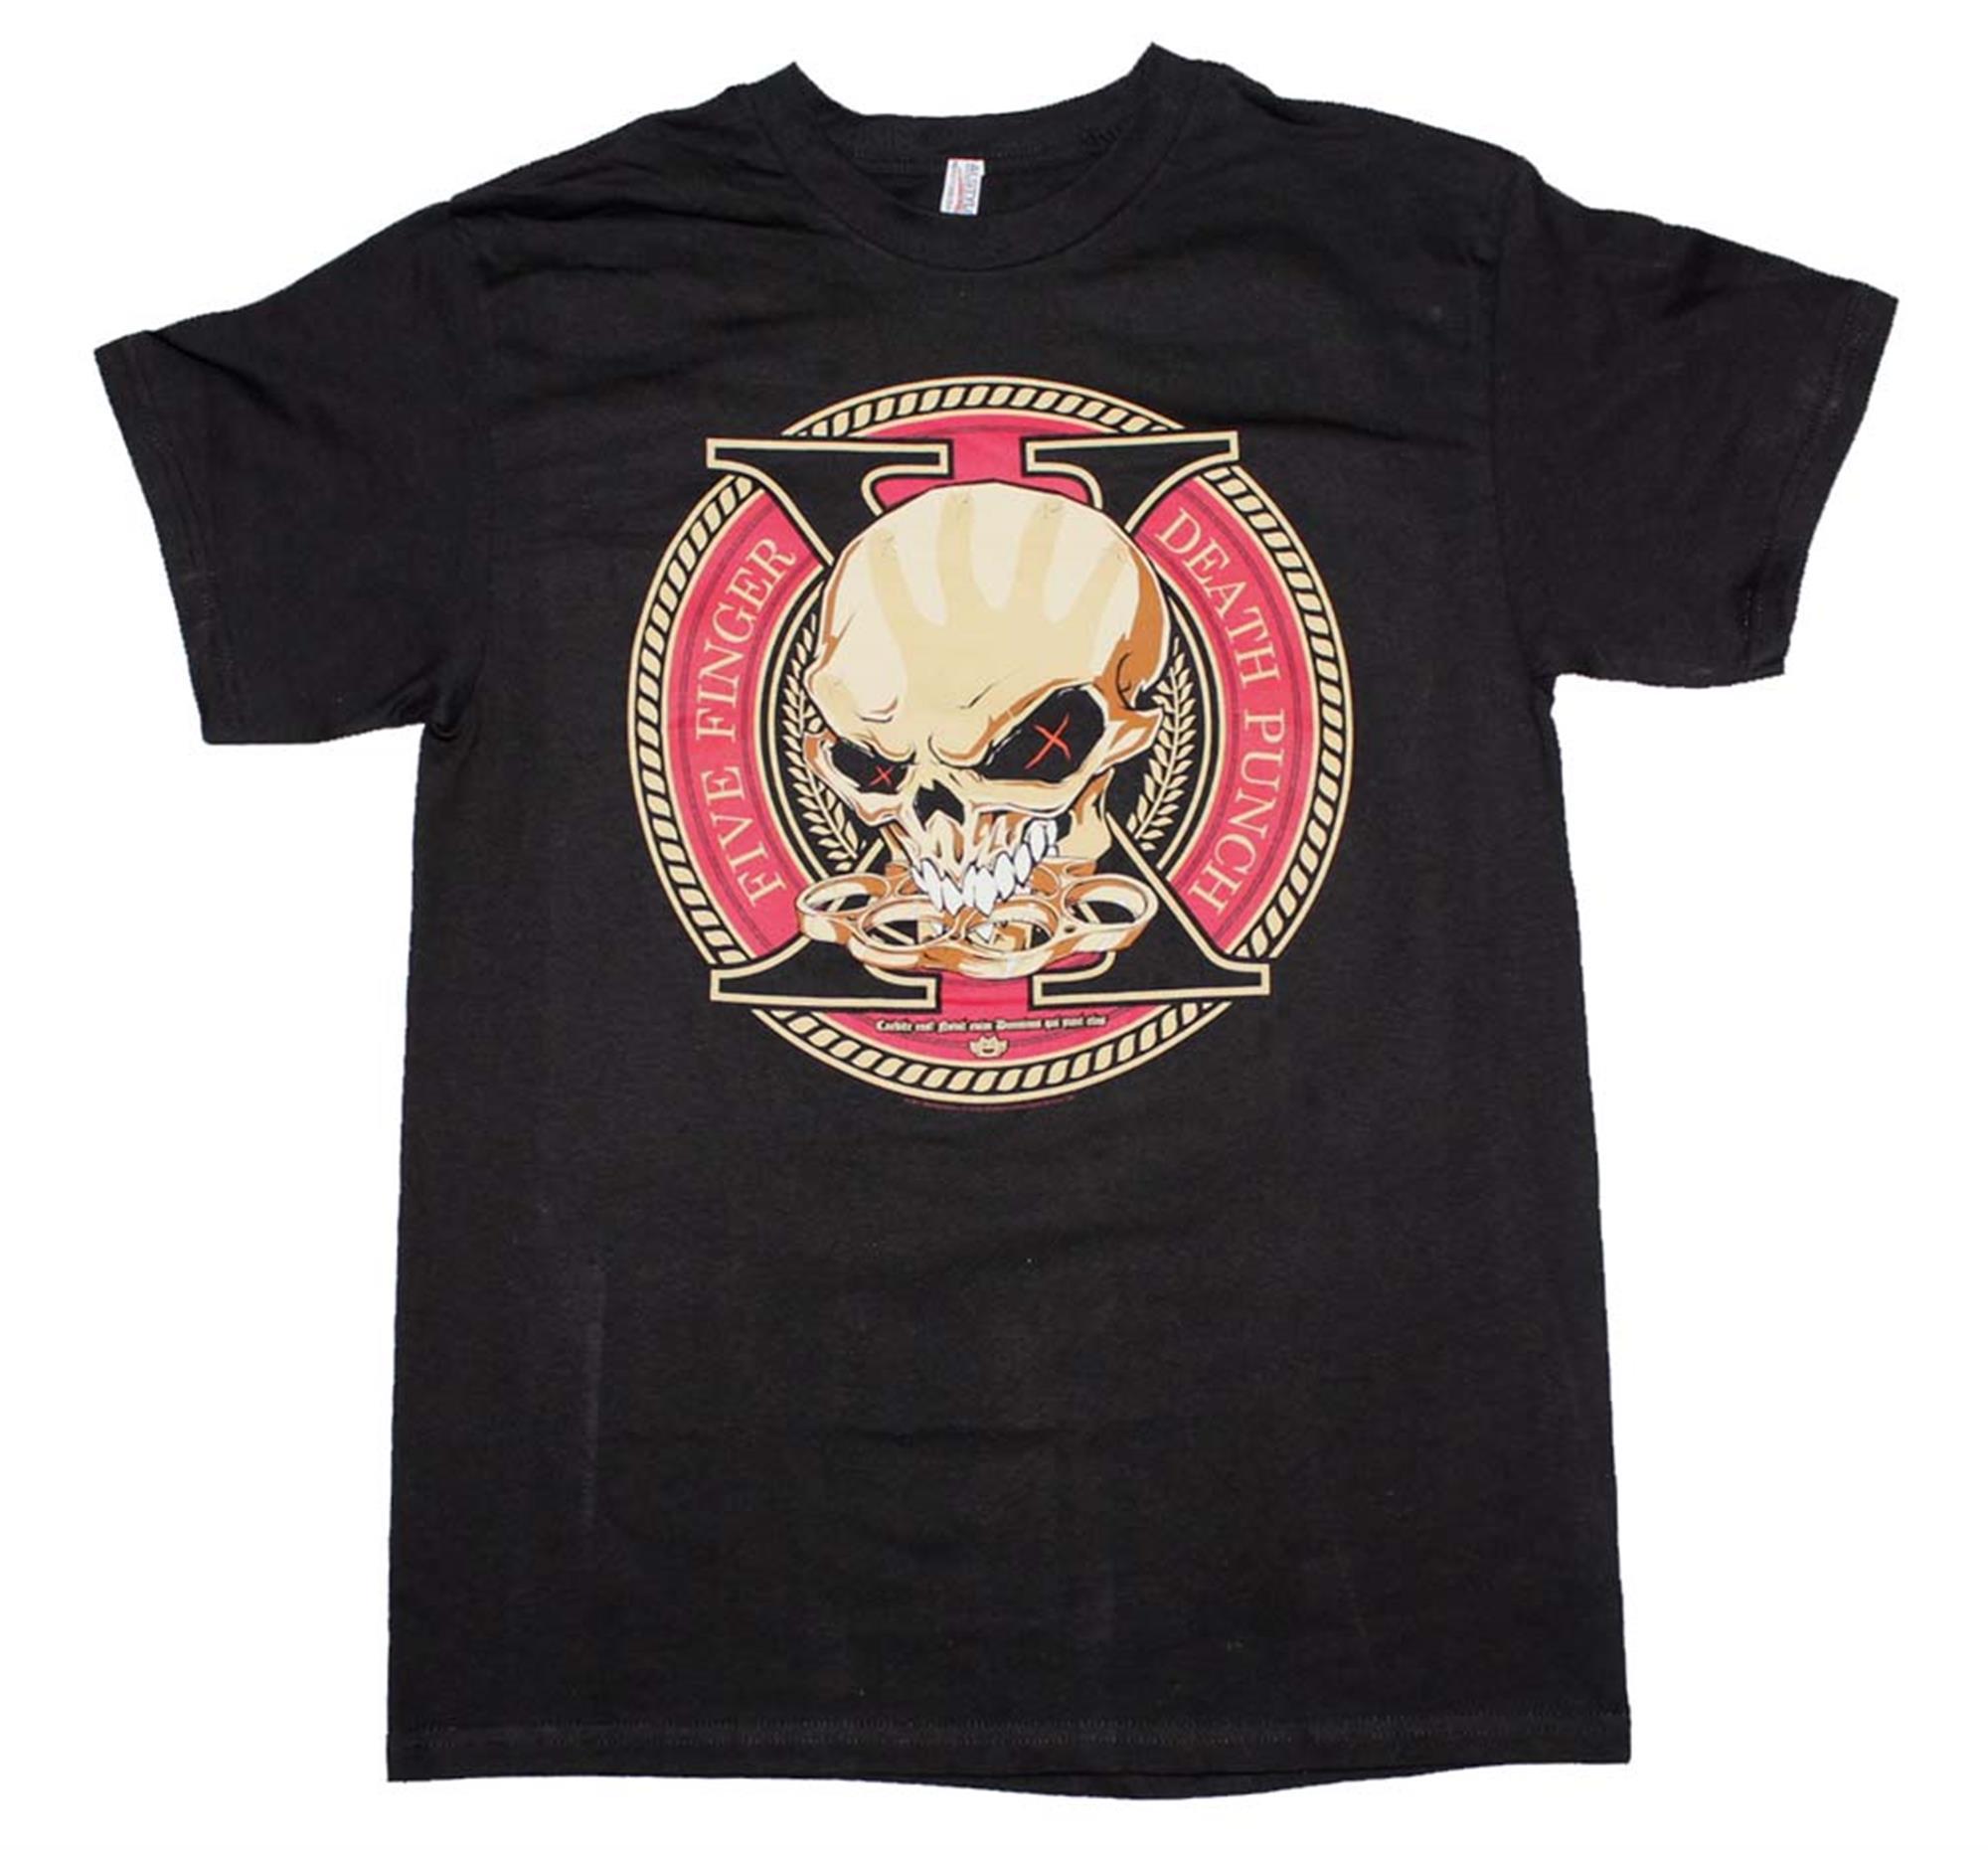 Five Finger Death Punch Decade Of Destruction T-Shirt